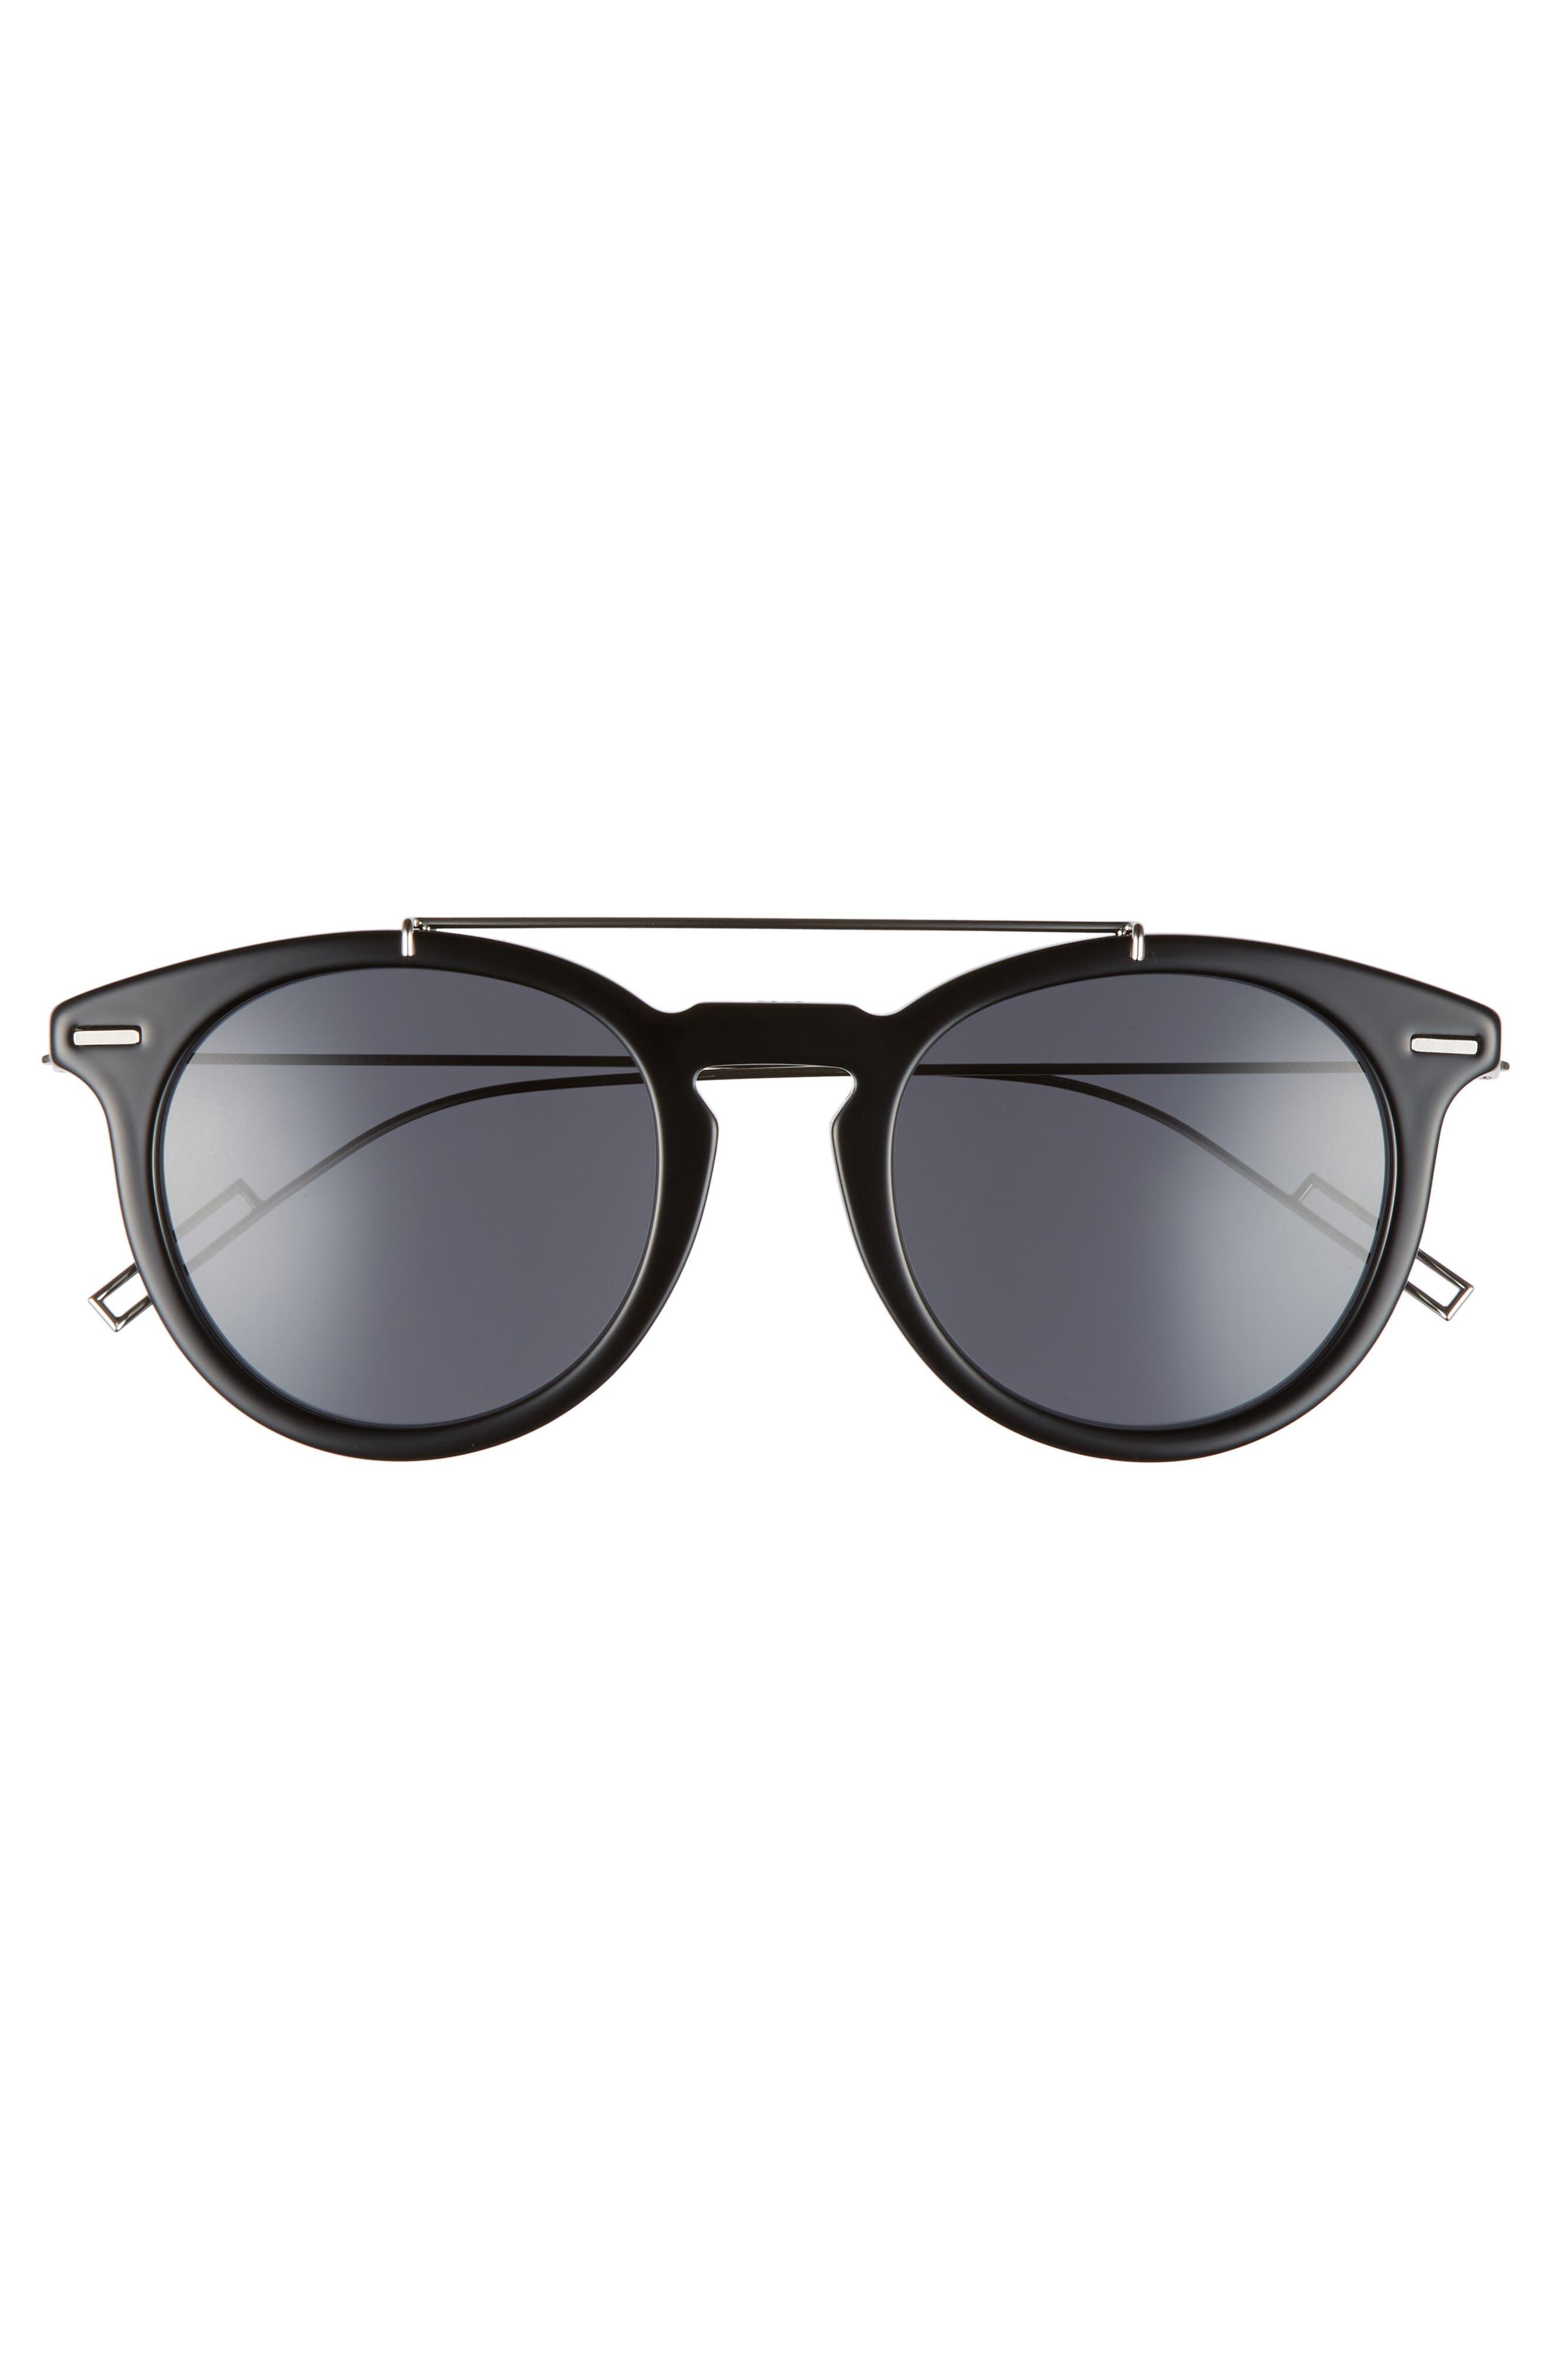 Master 51mm Sunglasses,                             Alternate thumbnail 2, color,                             BLACK